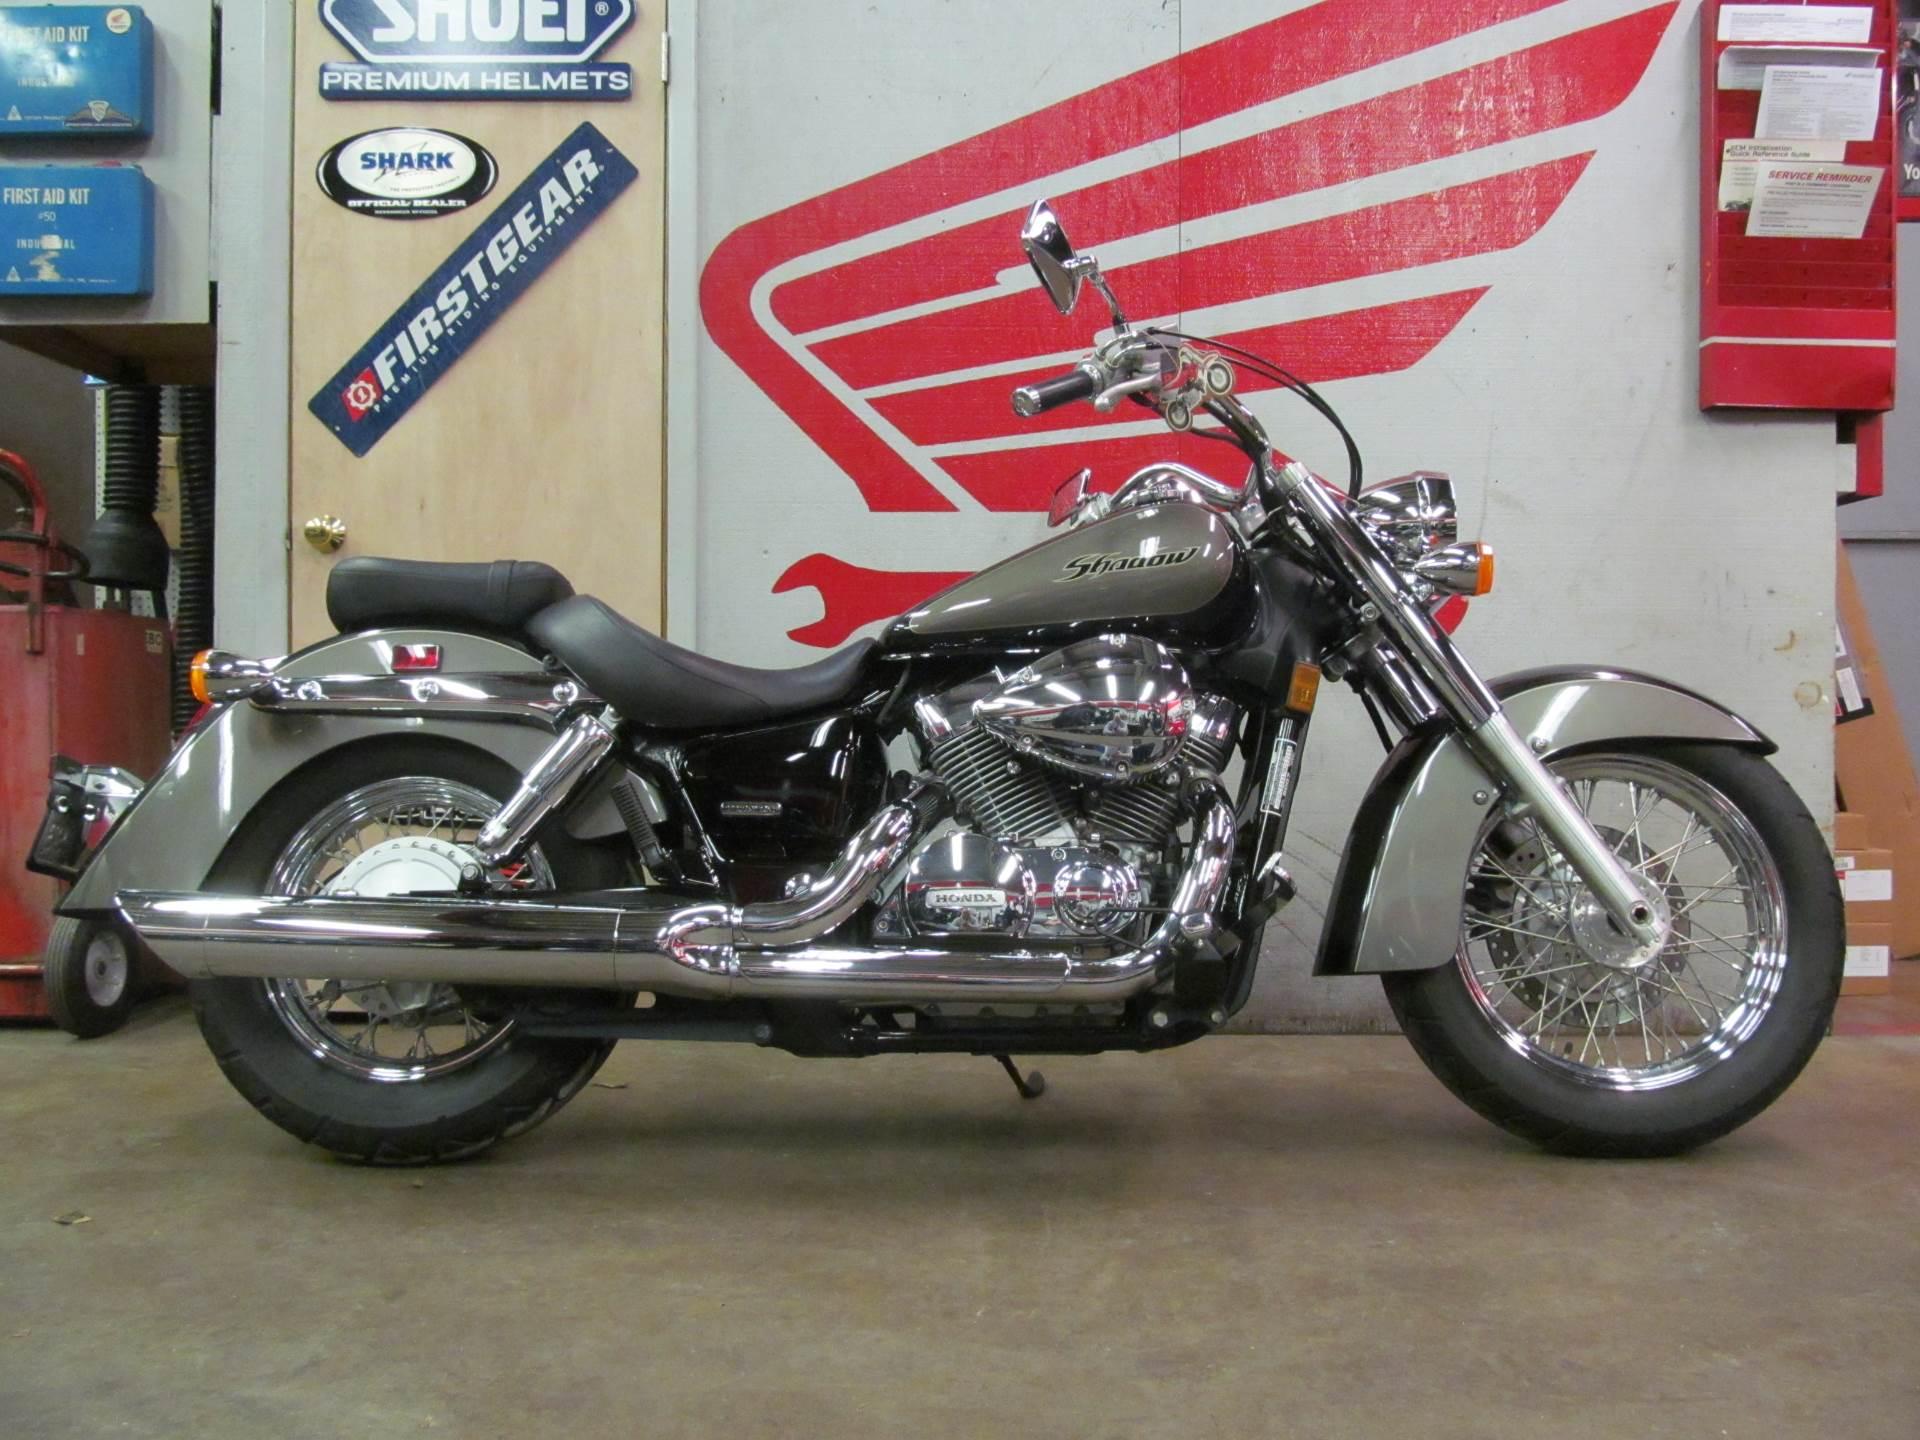 Used 2007 Honda Shadow Aero Motorcycles In Crystal Lake Il Stock